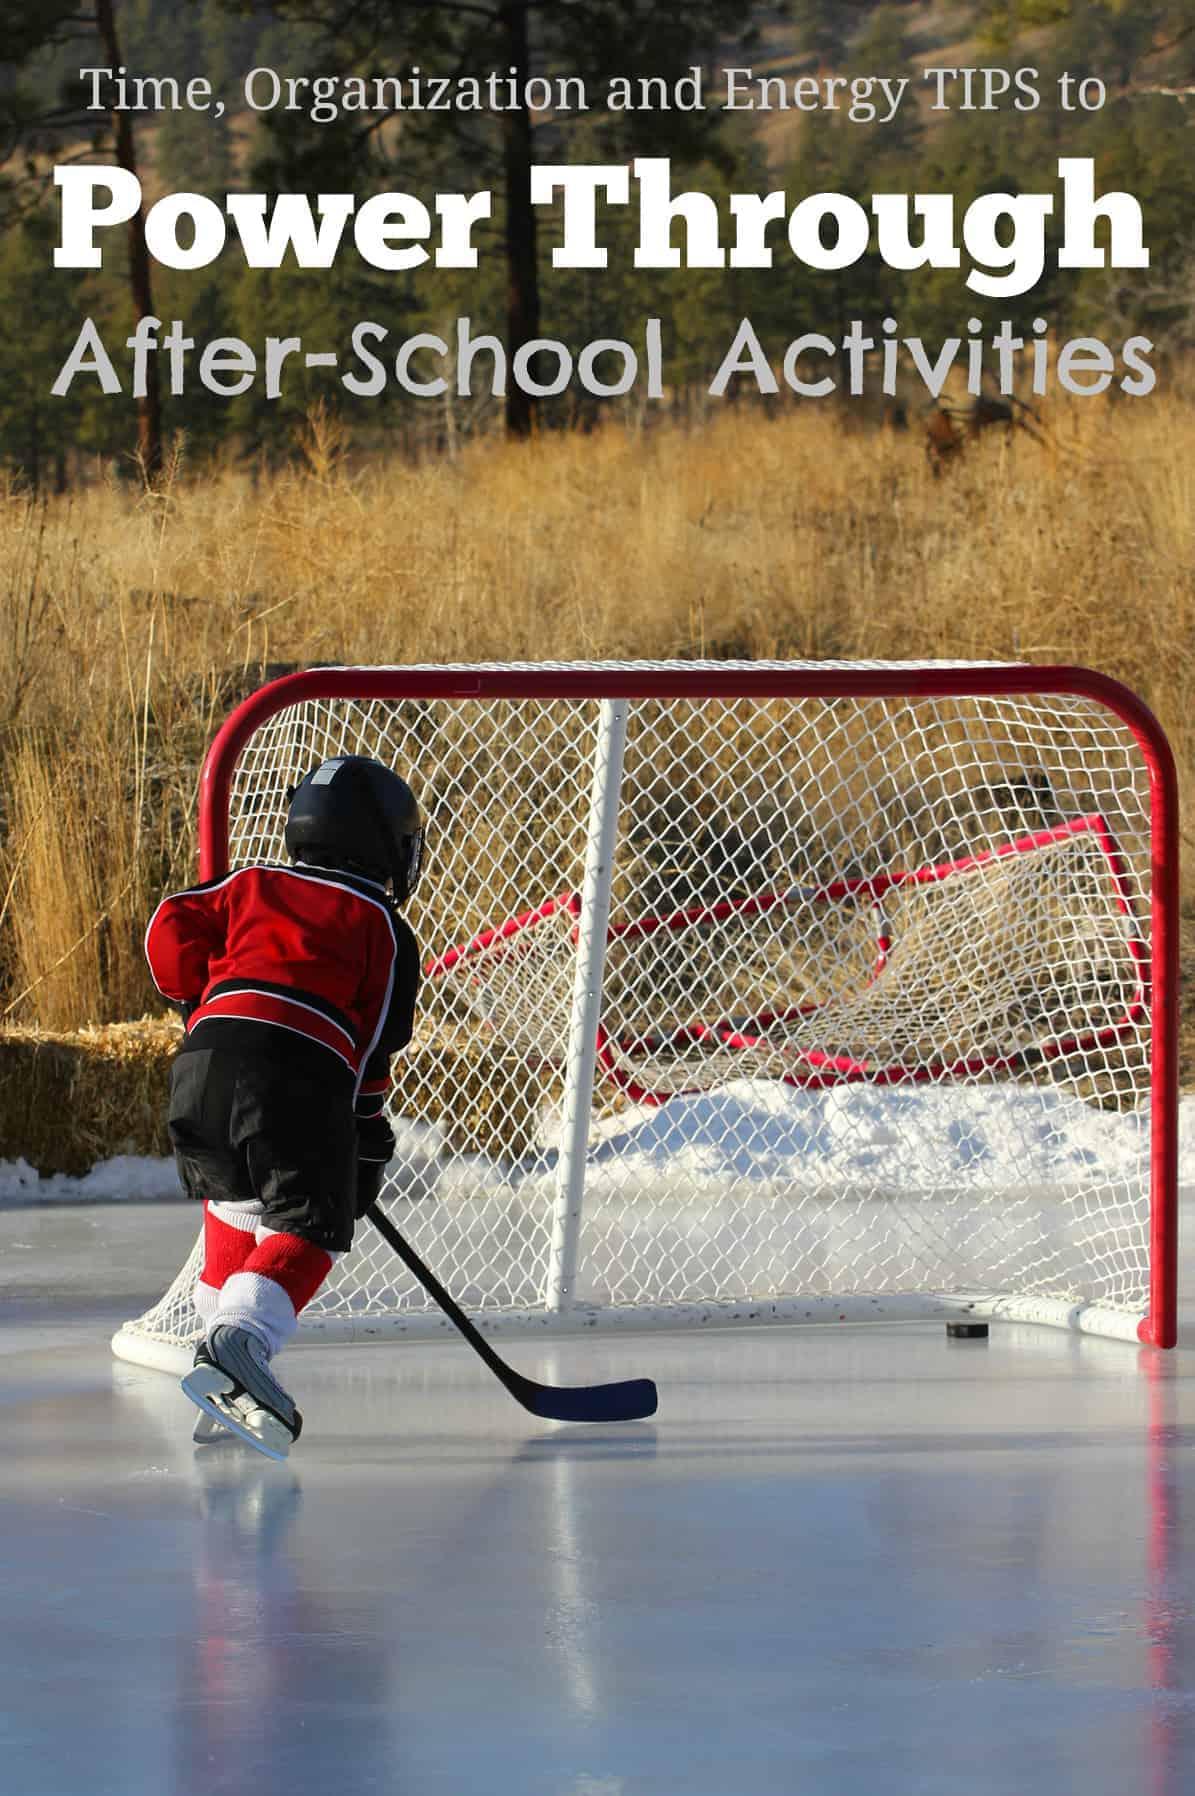 Tips to Power Through After-School Activities